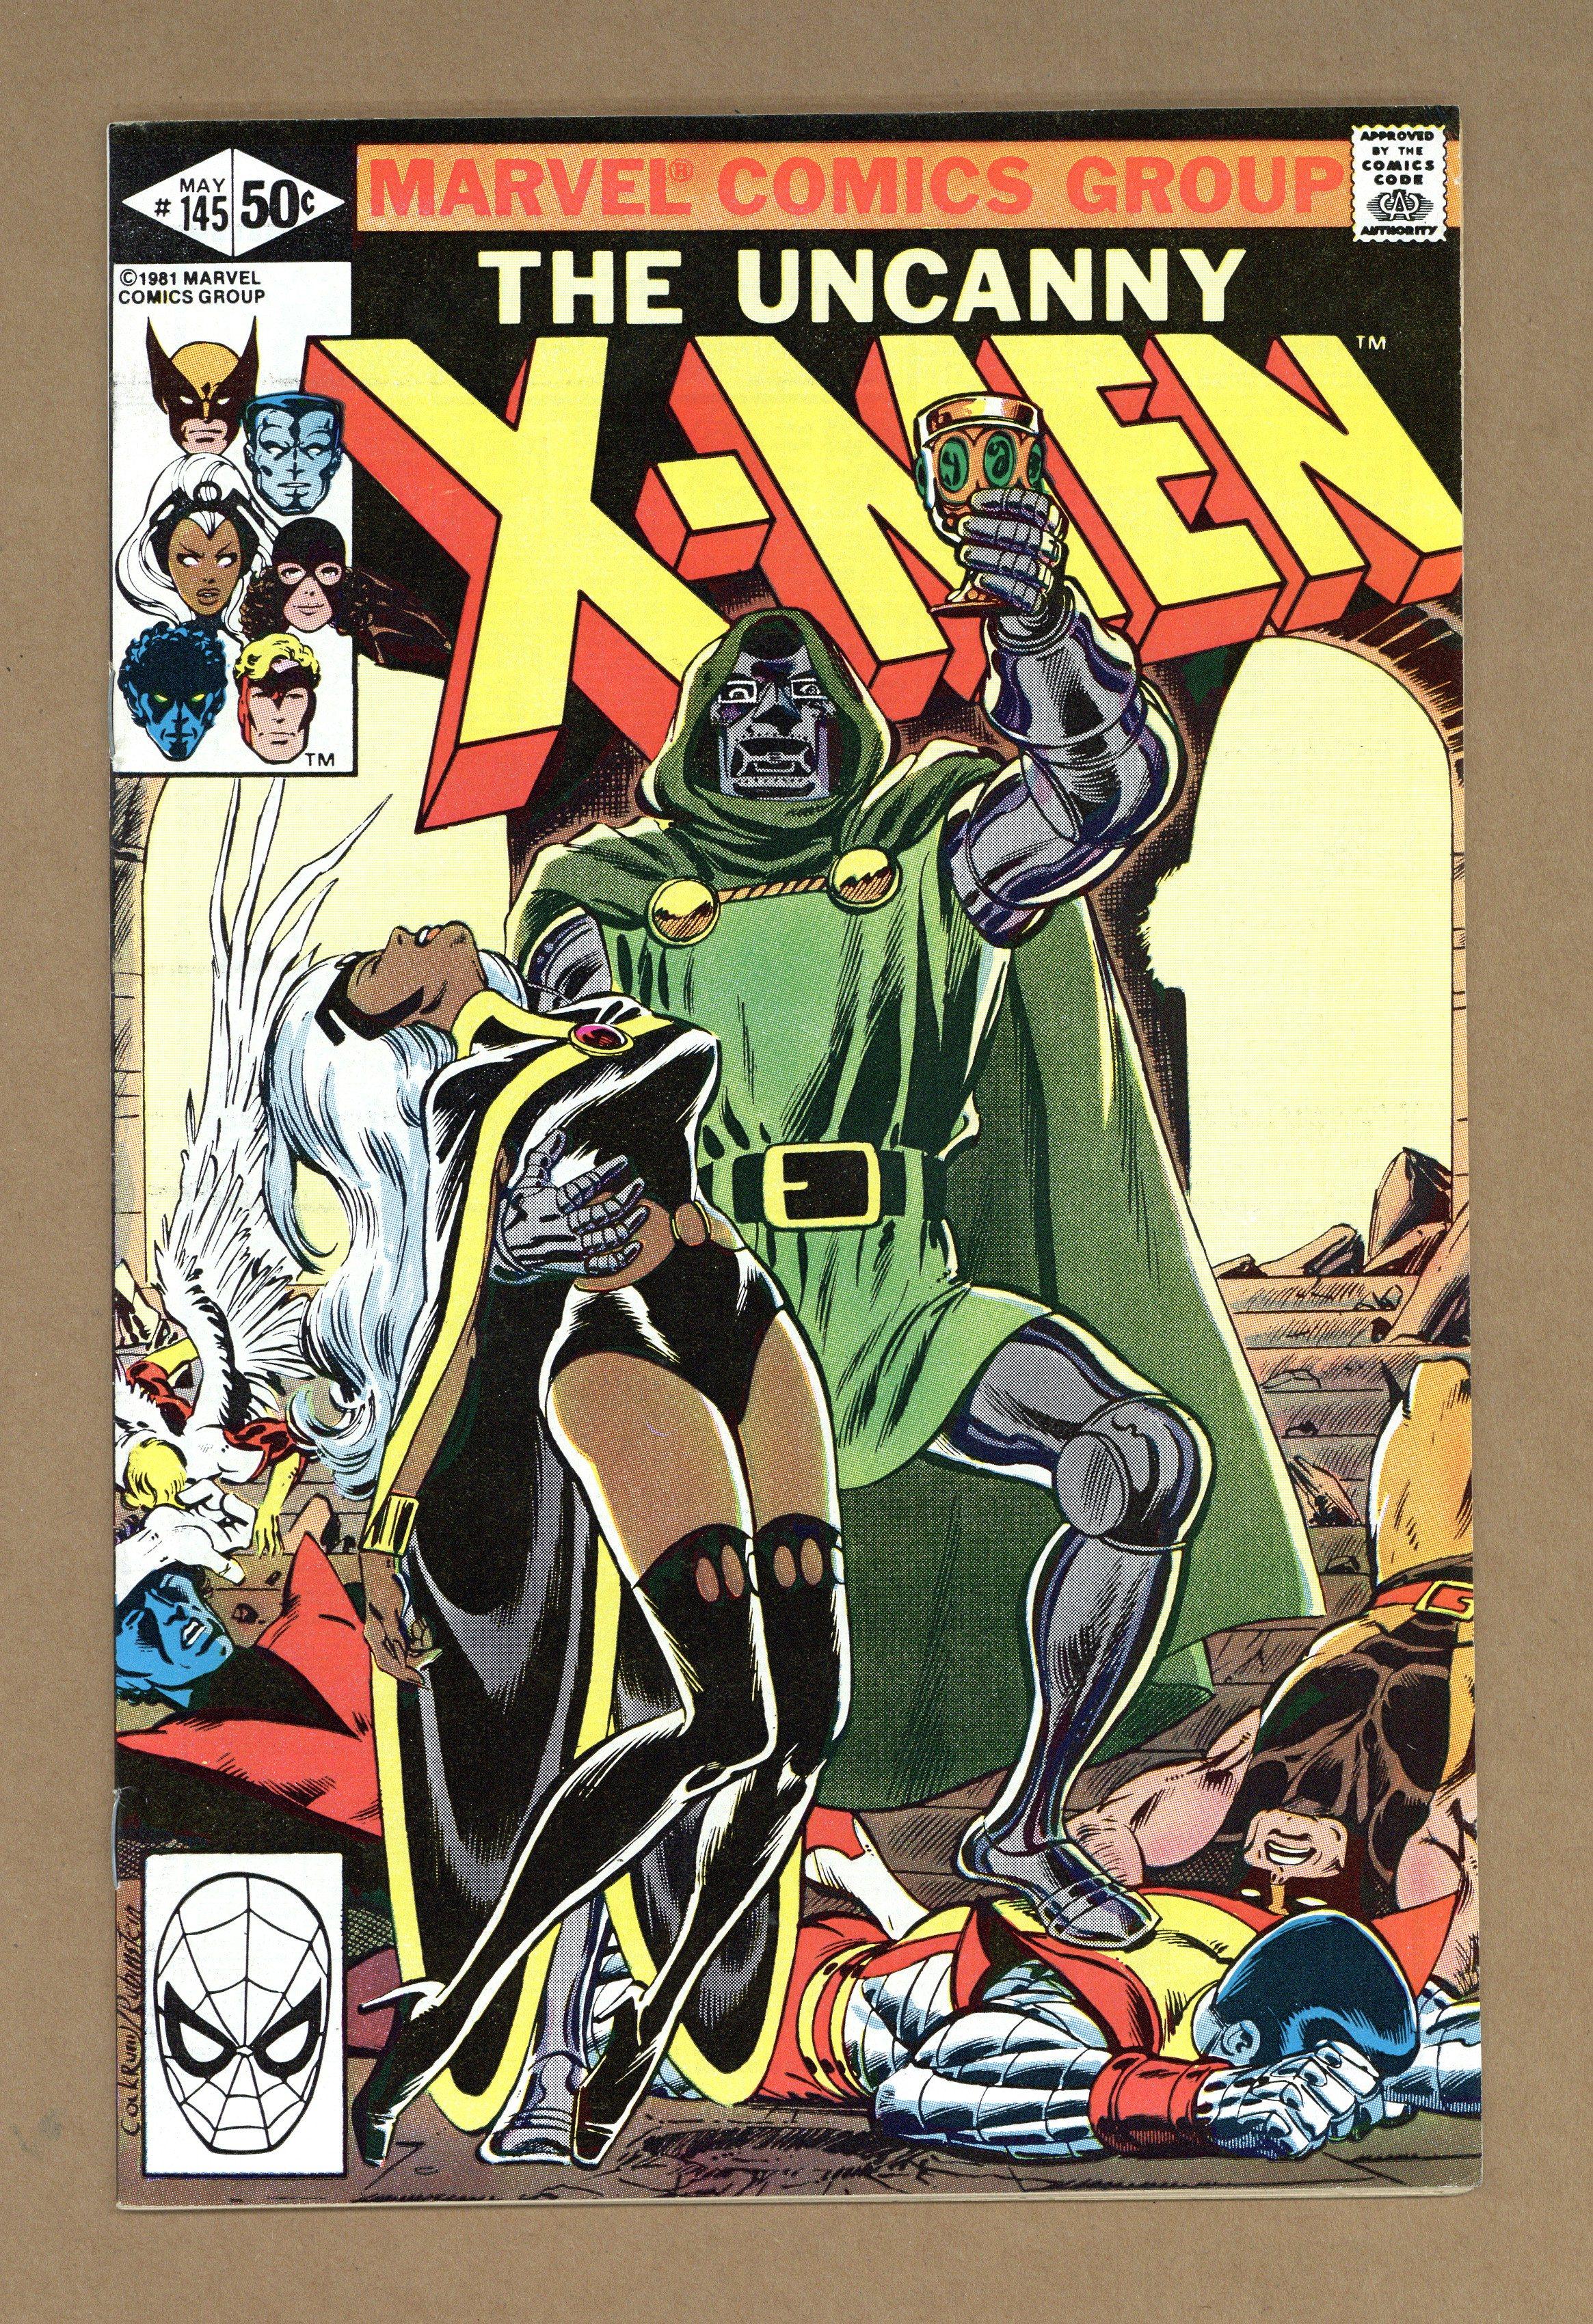 Marvel Comics 1981 Stock Image Direct X-MEN #151 VG Dave Cockrum Uncanny